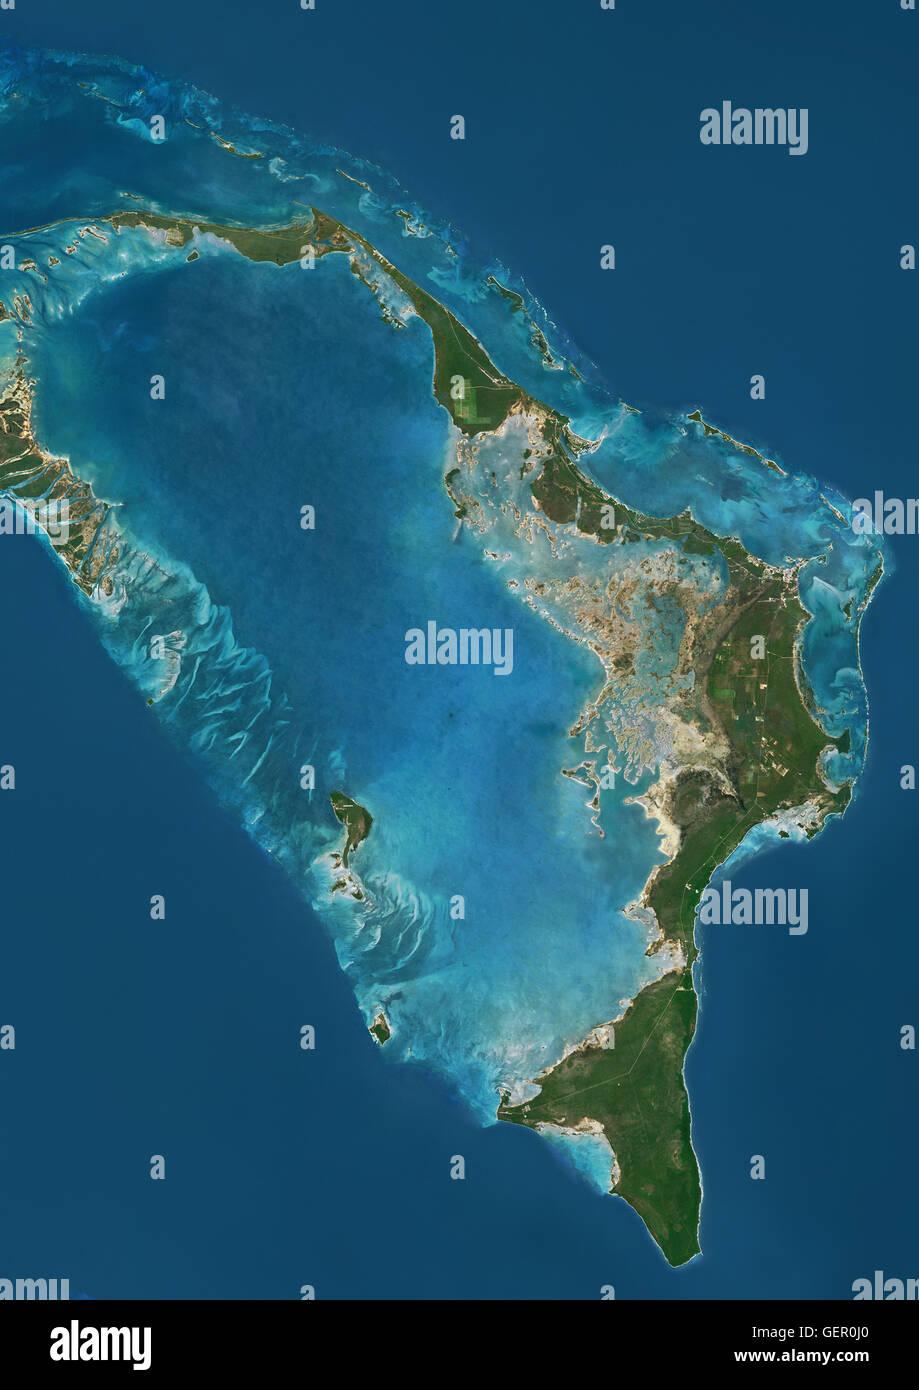 Great Abaco Island Map Stock Photos & Great Abaco Island Map ... on world map bahamas, eleuthera bahamas, map of the abaco islands, cat island bahamas, elbow island bahamas, arial maps of abaco bahamas, map all caribbean islands, harbour island bahamas, map of abaco with distances, road map of abaco bahamas, map of southern caribbean islands, map showing bahamas, andros island bahamas, crooked island bahamas, great iguana island bahamas, sea of abaco bahamas, grand lucayan bahamas, map of marsh harbour abaco, map of scrub island british virgin islands, nautical map of abaco bahamas,